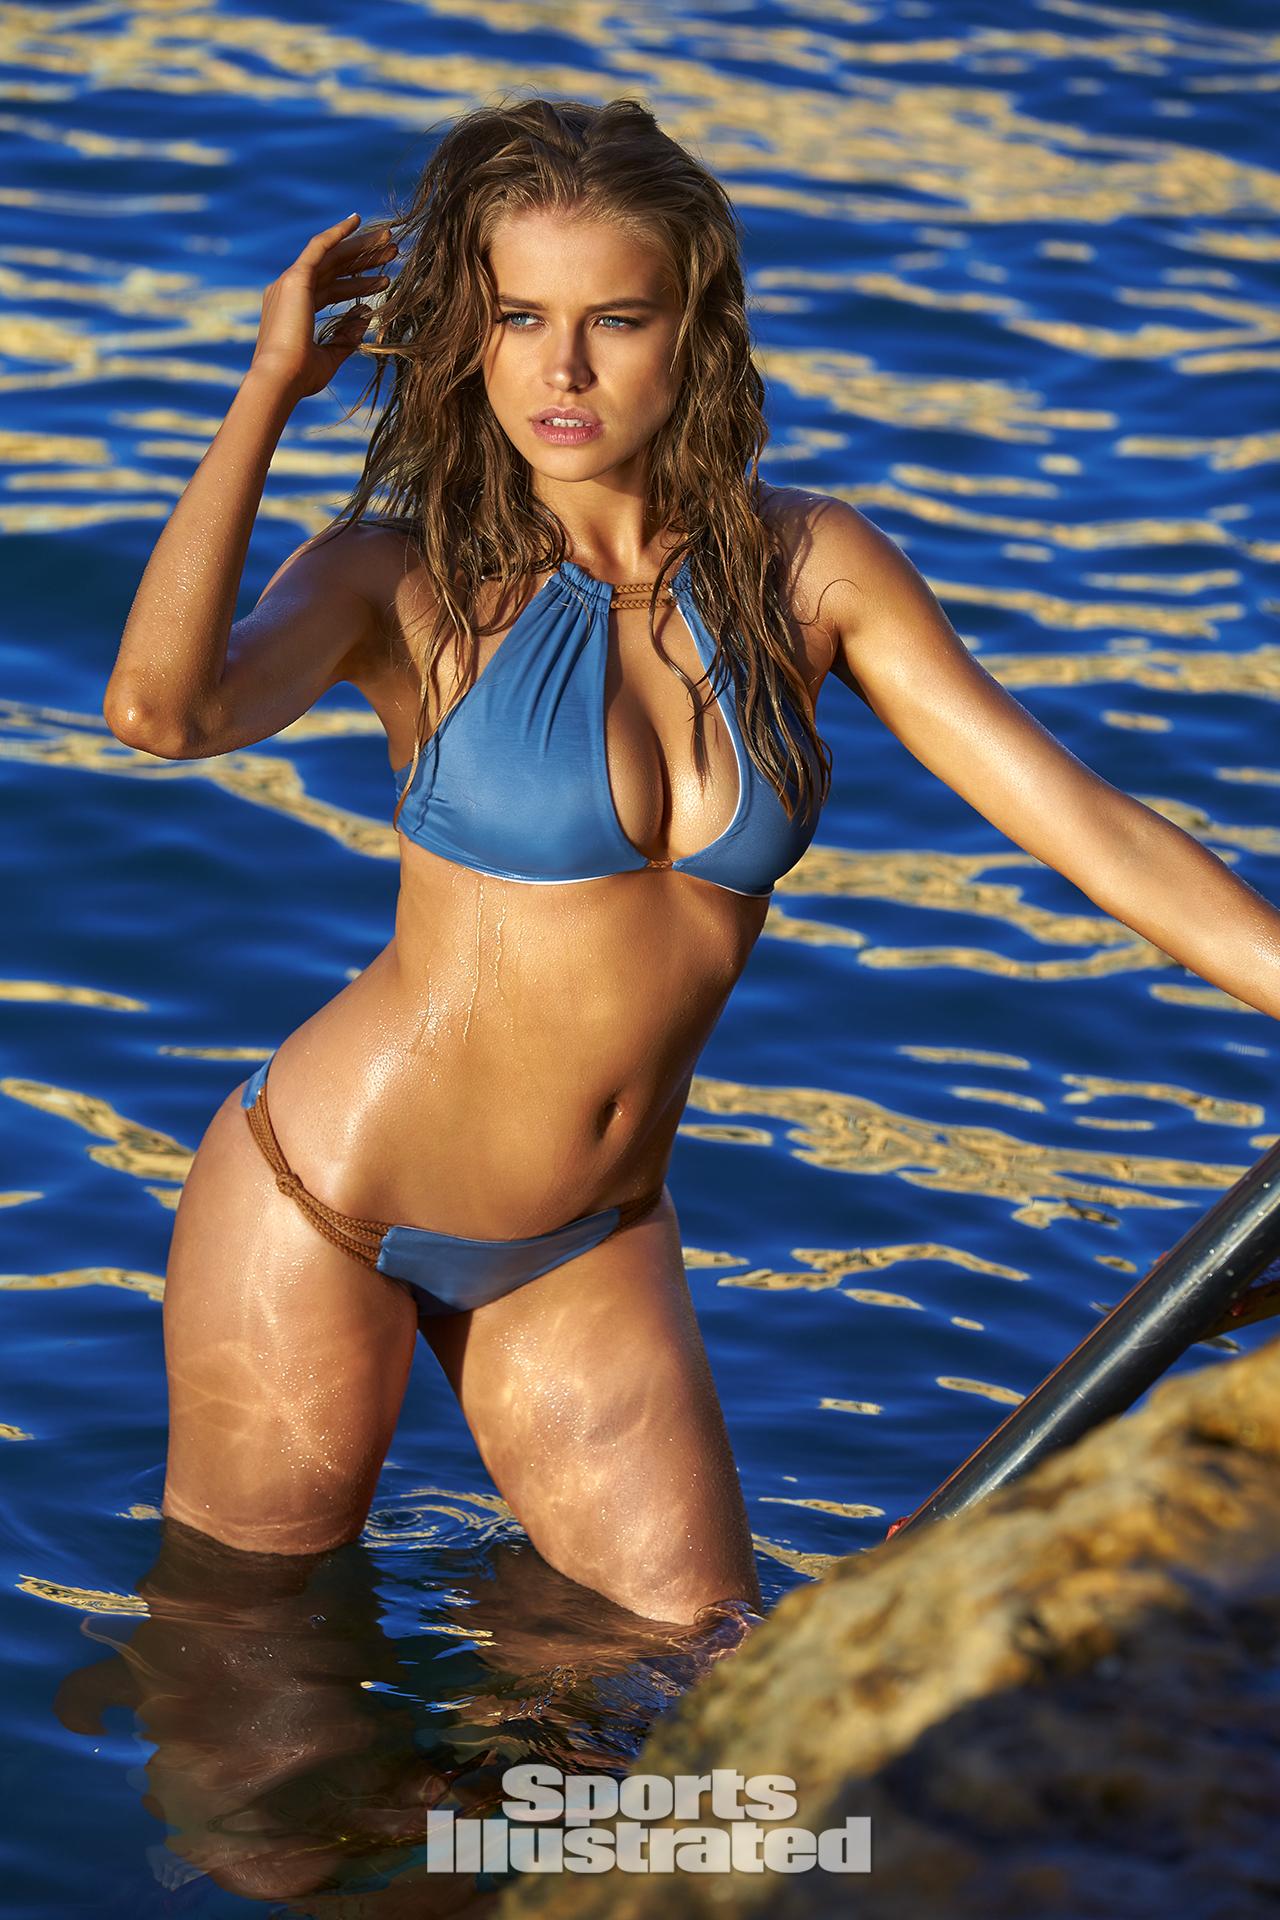 Tanya Mityushina, SI Swimsuit 2016